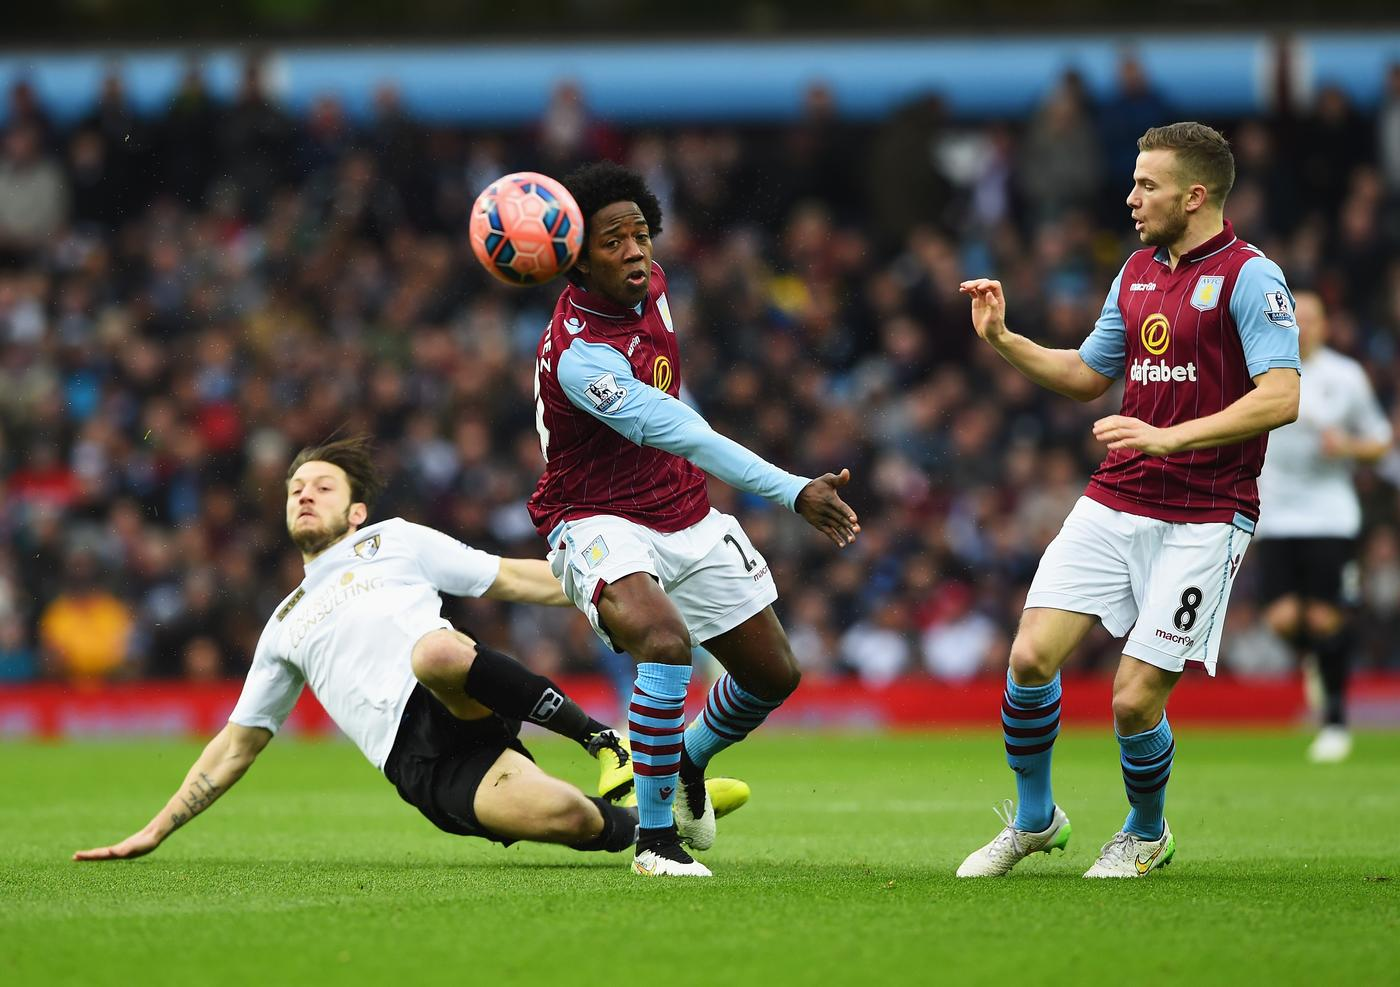 Five eyebrow-raising stats about Aston Villa's season involving Tom Cleverley, Christian Benteke and Carles Gil